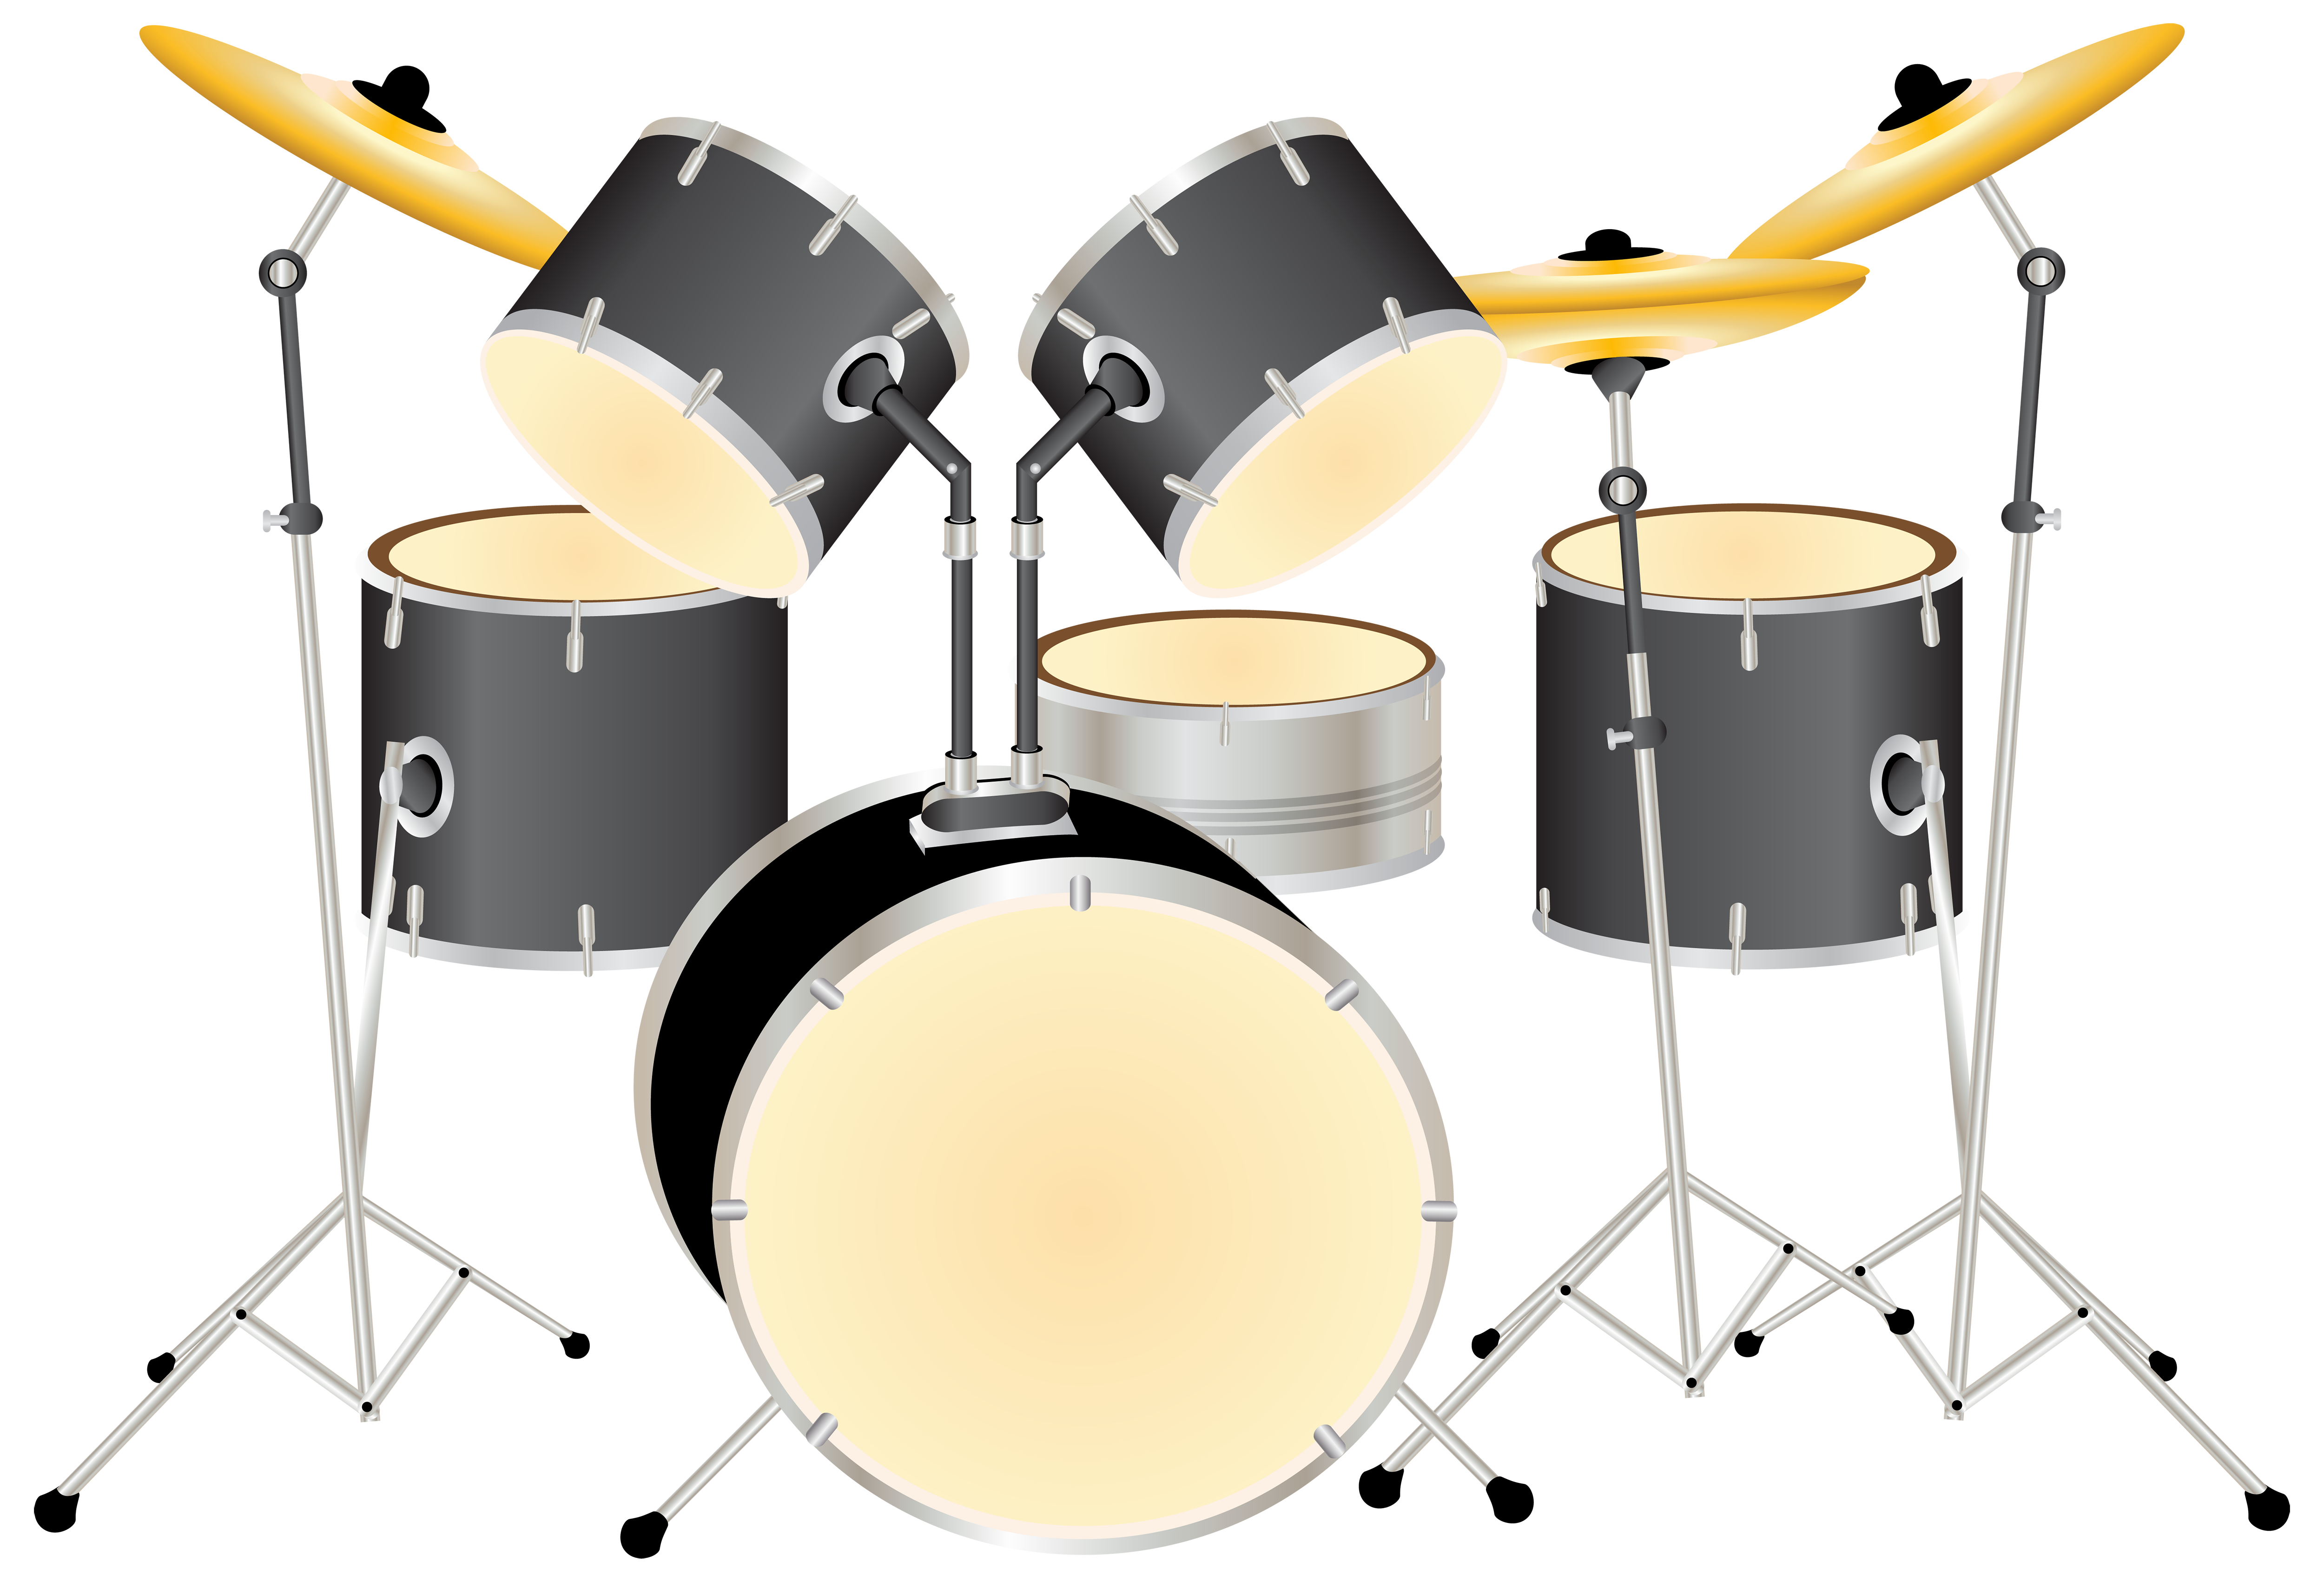 Red drum fish clipart vector stock Drum Kit PNG Clipart - Best WEB Clipart vector stock